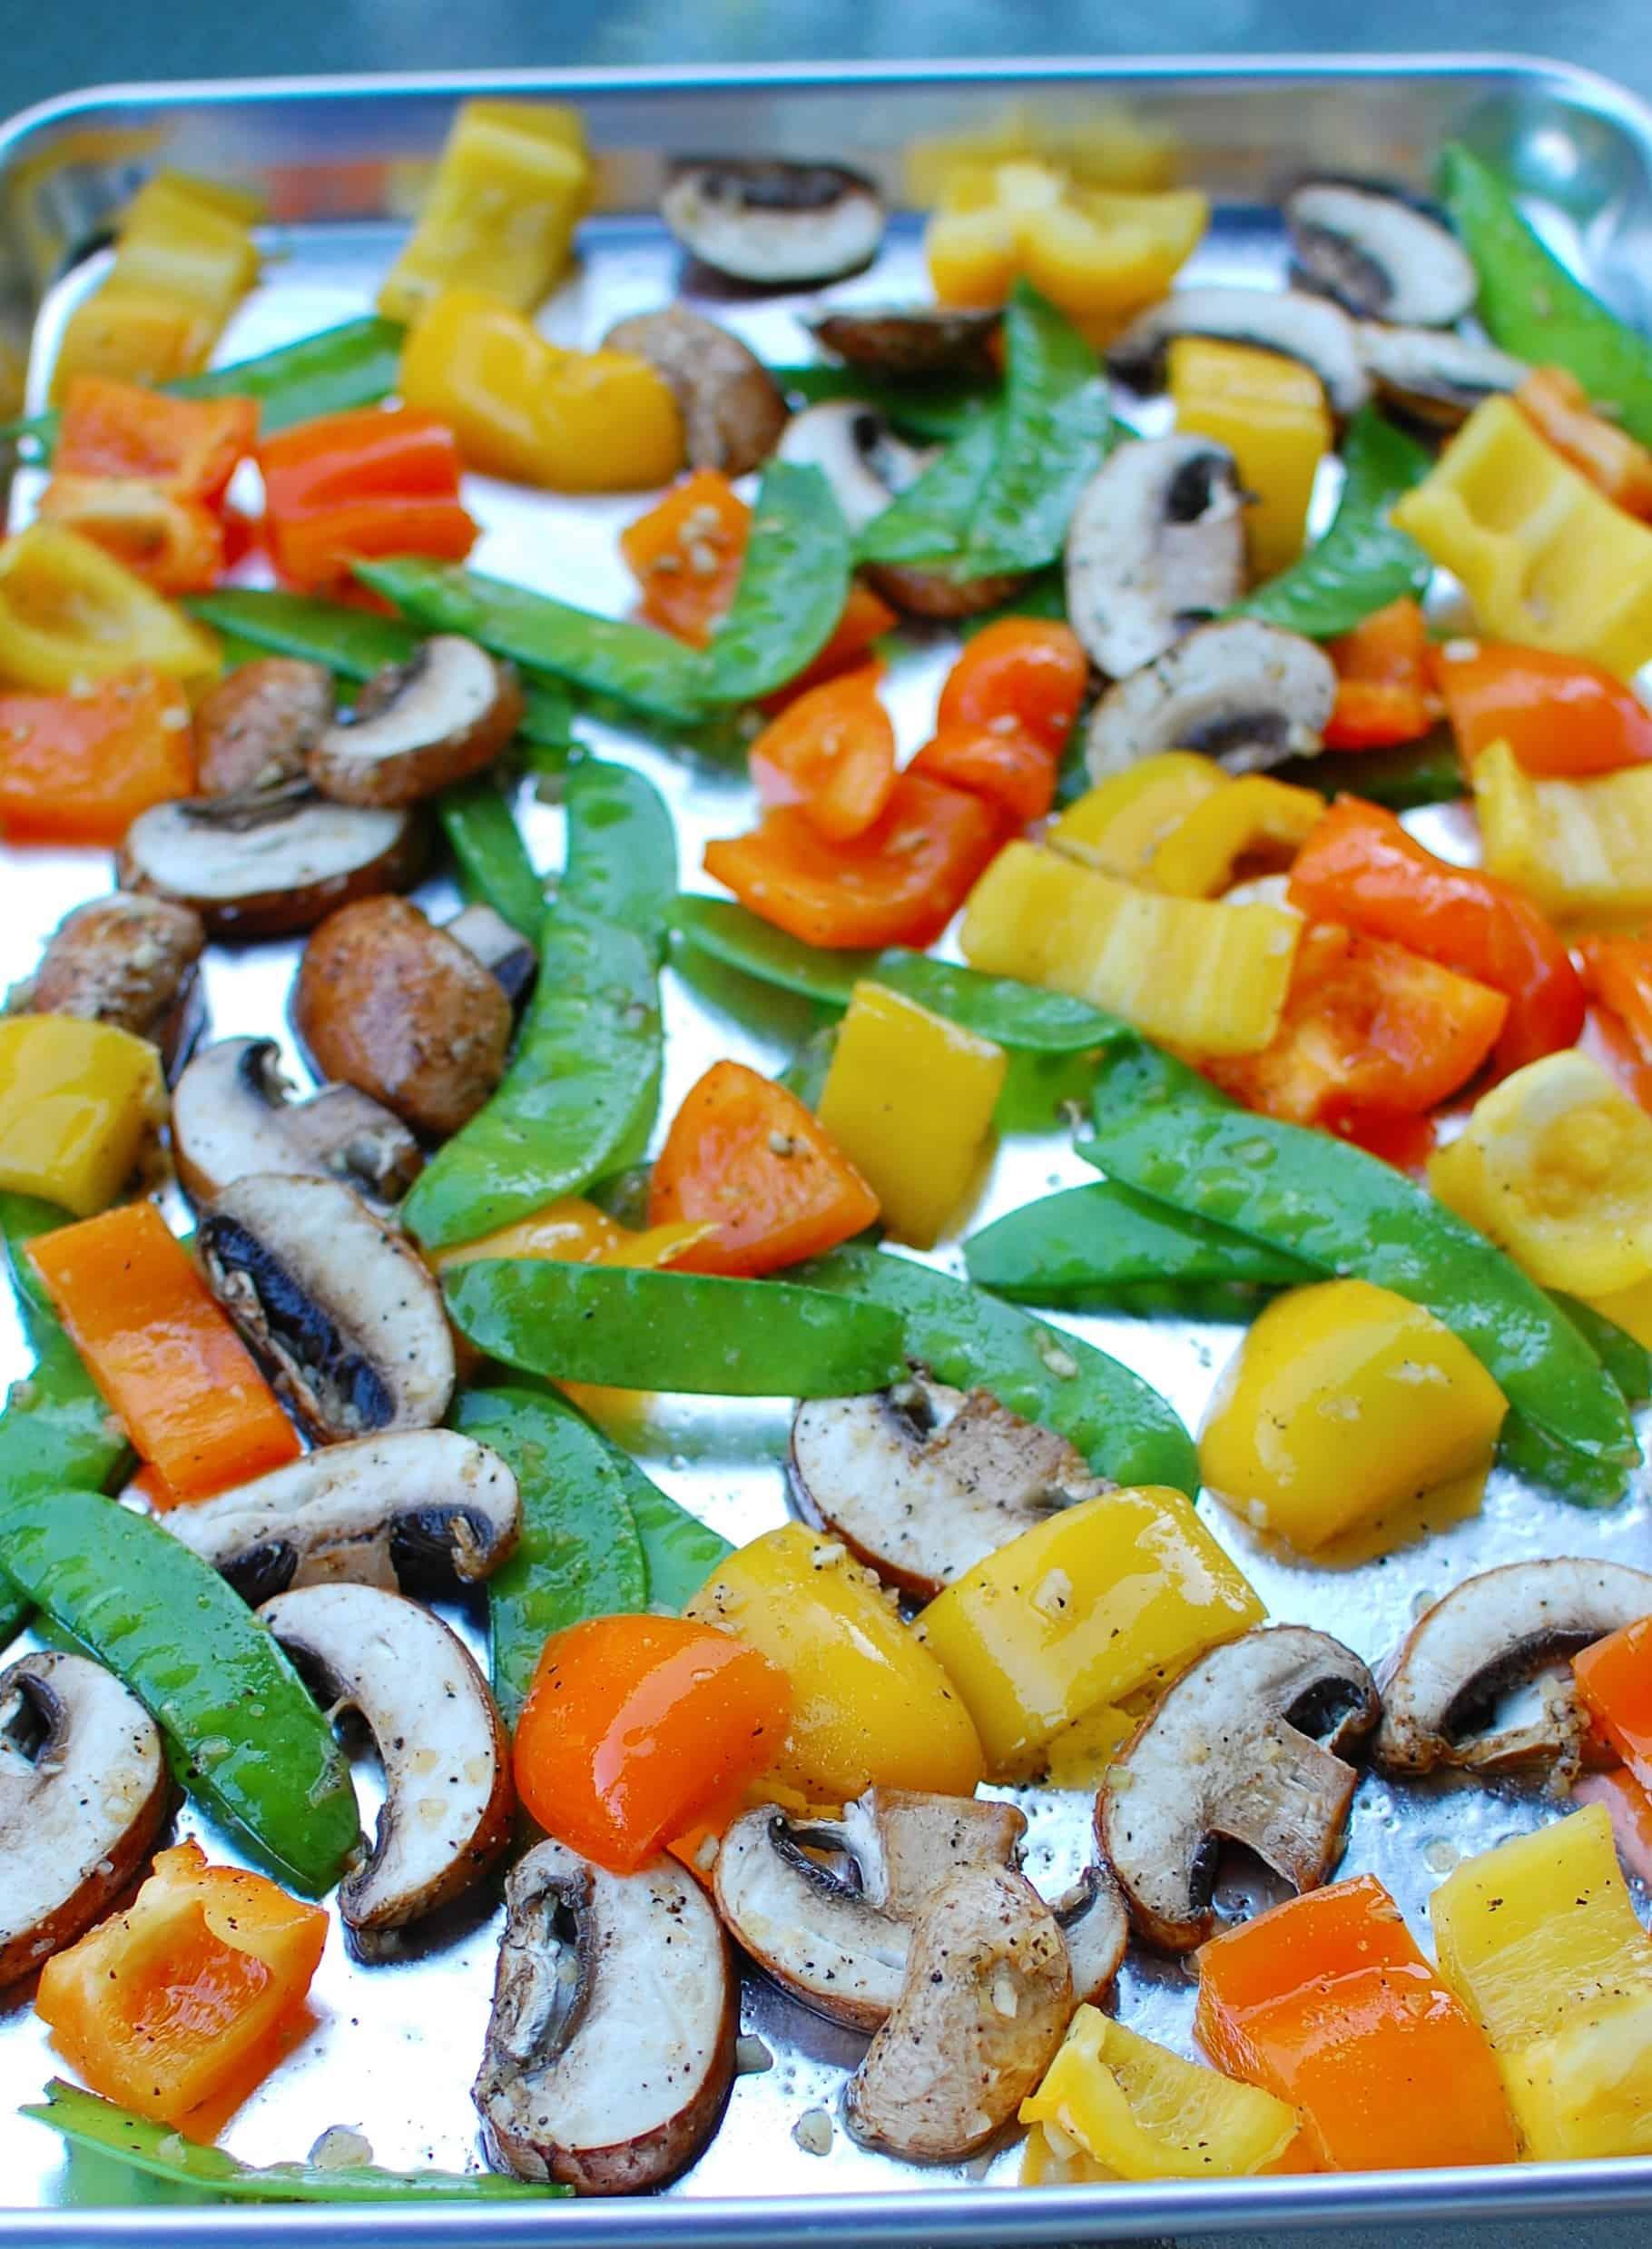 vegetable marinade | joeshealthymeals.com